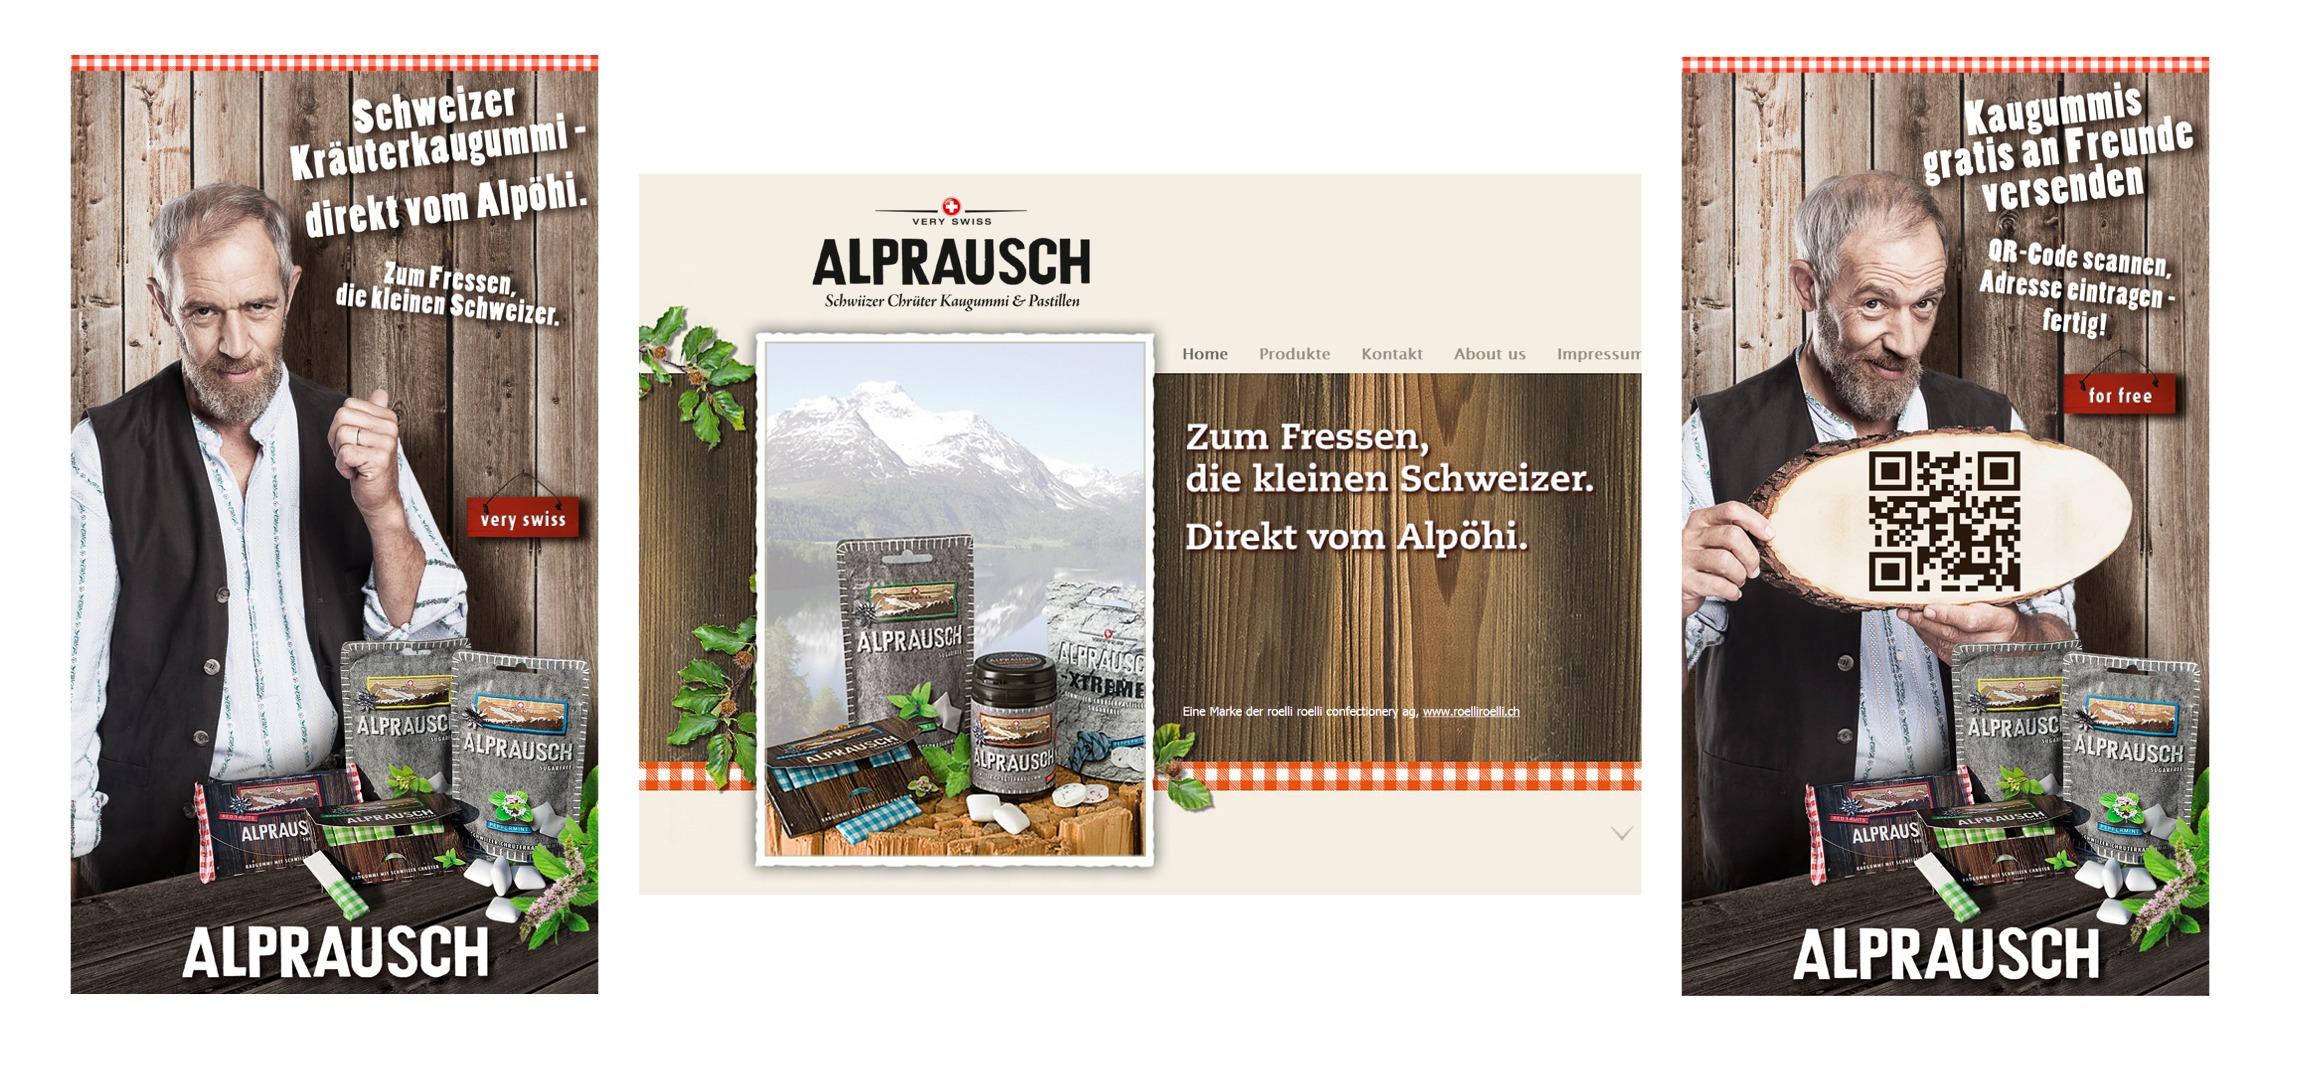 Alprausch model_website_prints advertising - ohne Rahmen